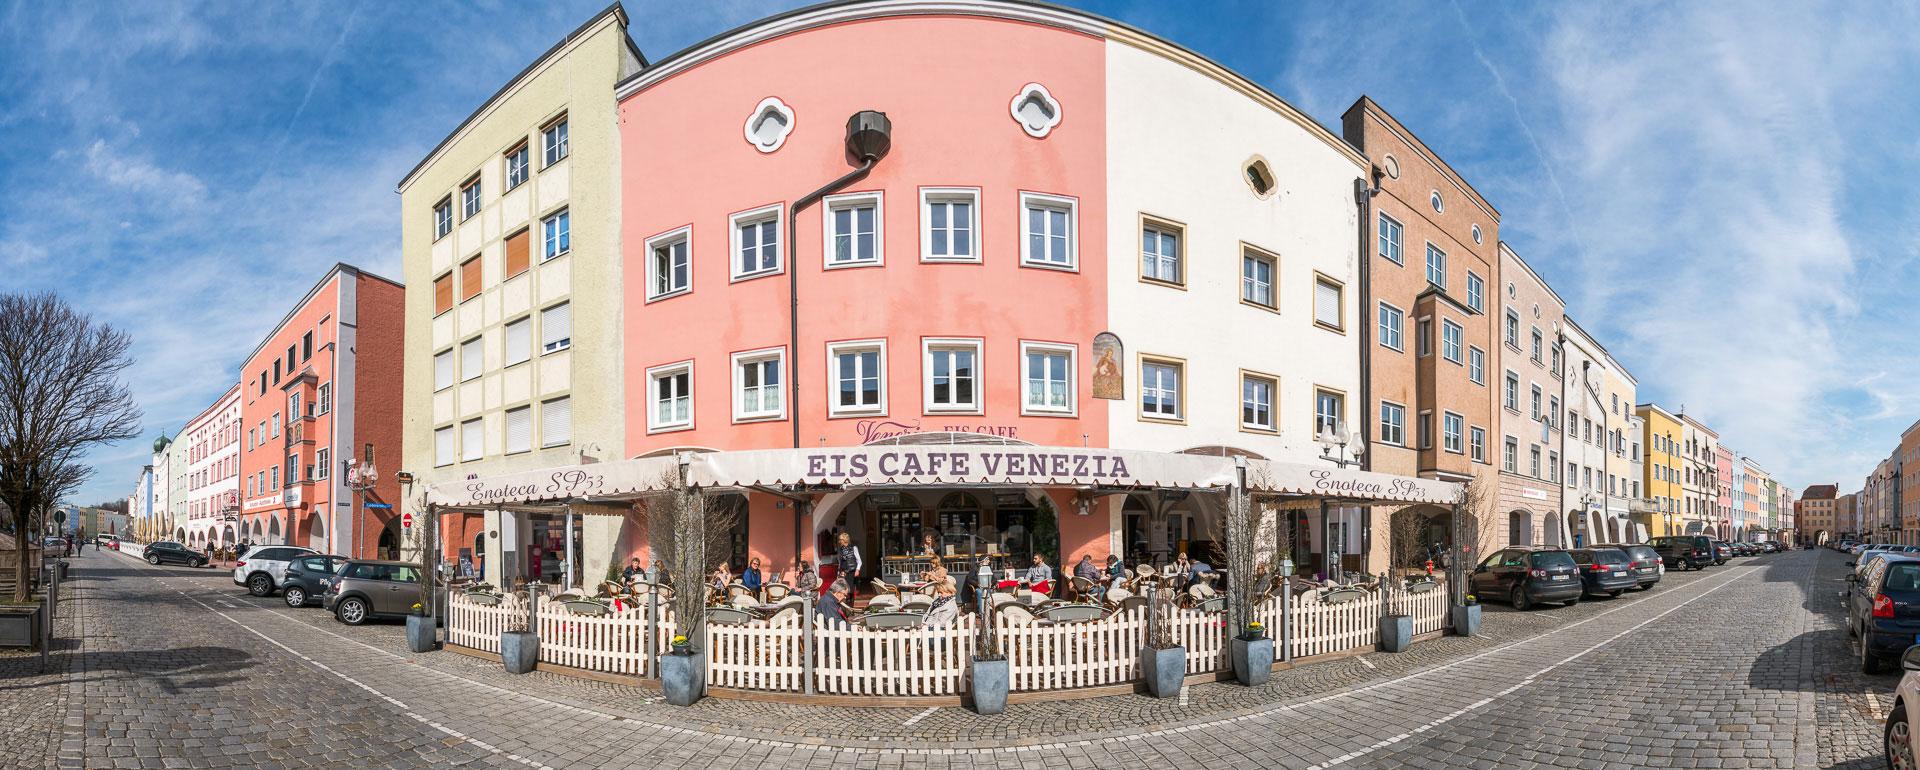 Eiscafe Venezia - Panorama